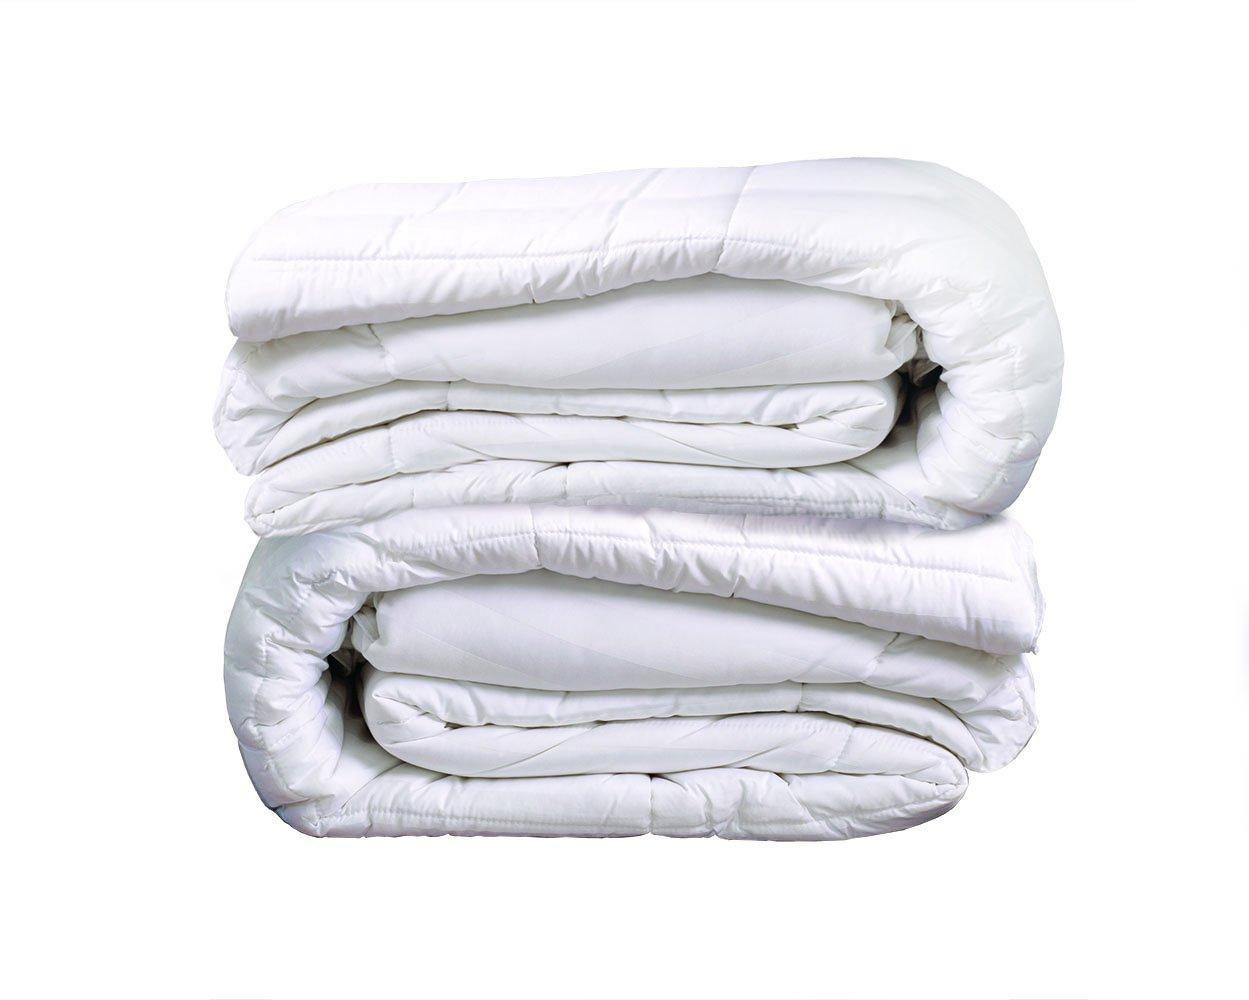 Cariloha Bamboo Duvet Comforter by 100% Viscose From Bamboo - All Season Duvet Comforter (Queen)